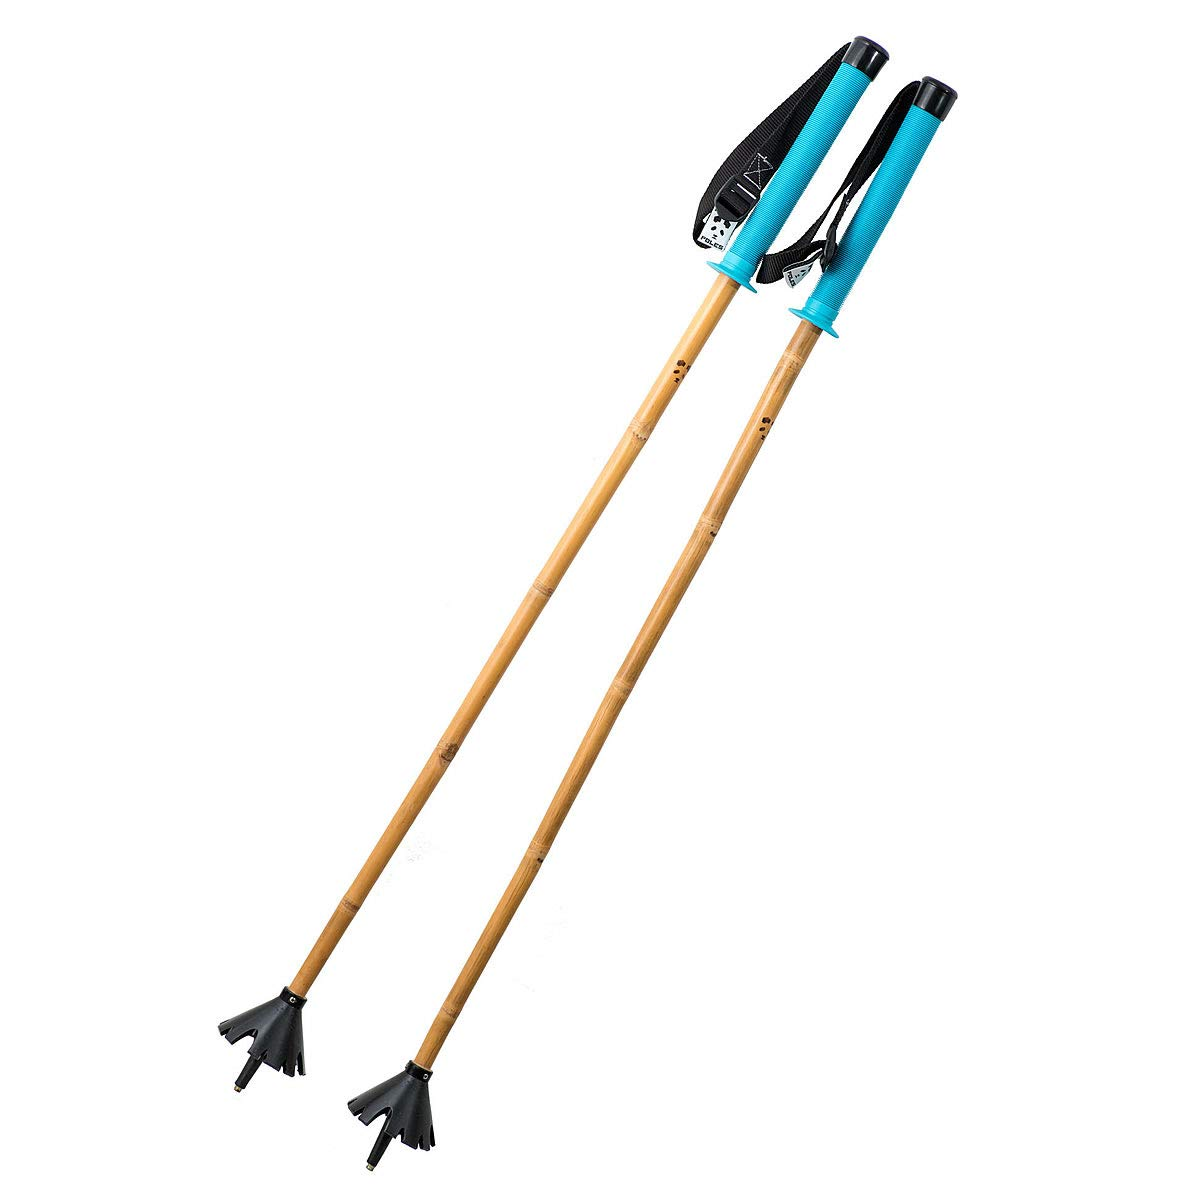 PANDA POLES(パンダポール) スキーストック SHOGUN Water 青 105cm ショーグン バンブーシャフト Panda Poles スキーポール